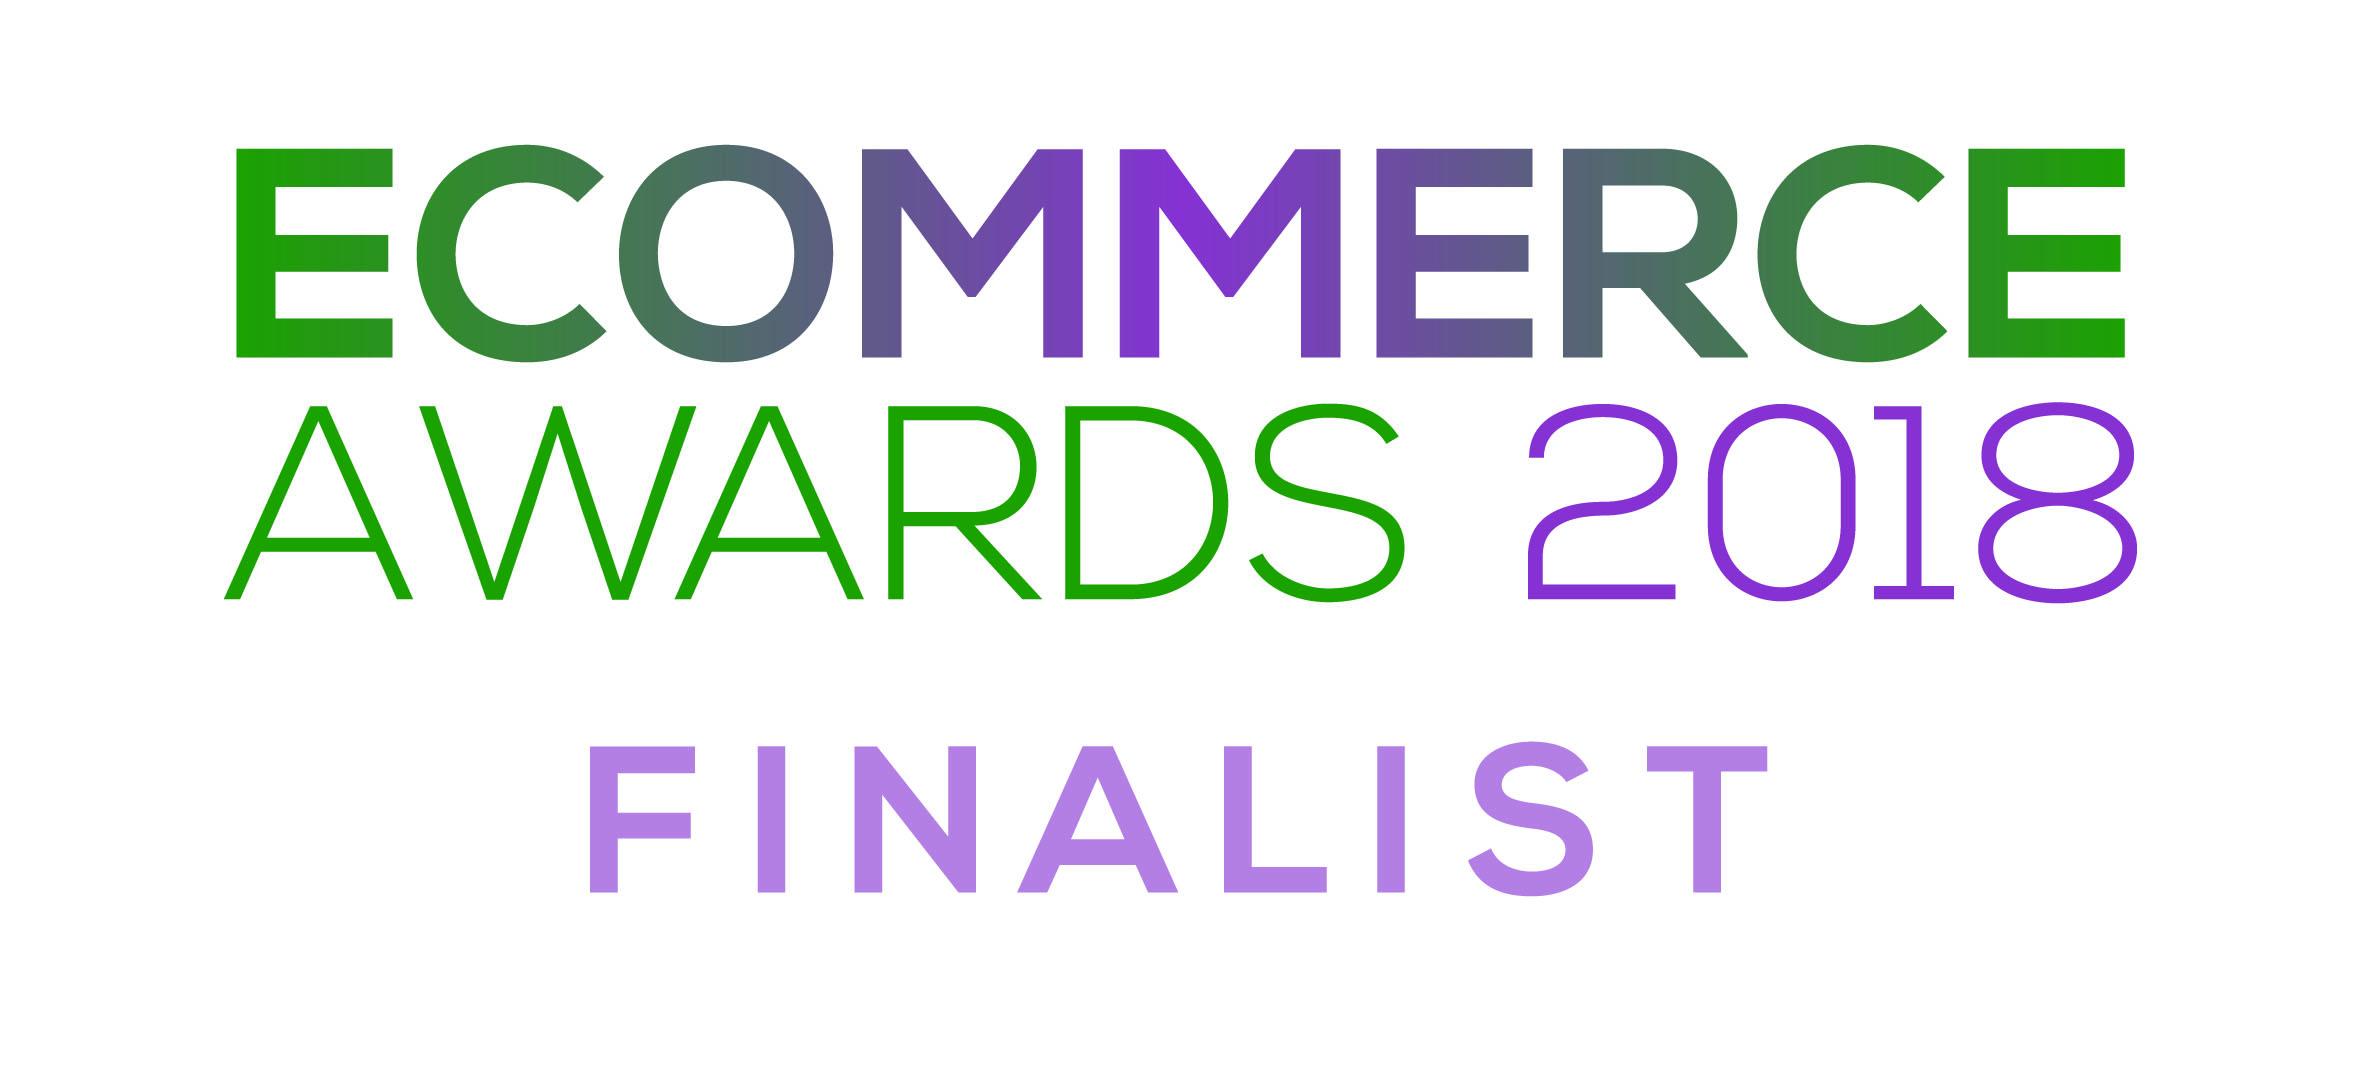 Ecomerce FINALIST logo 2018